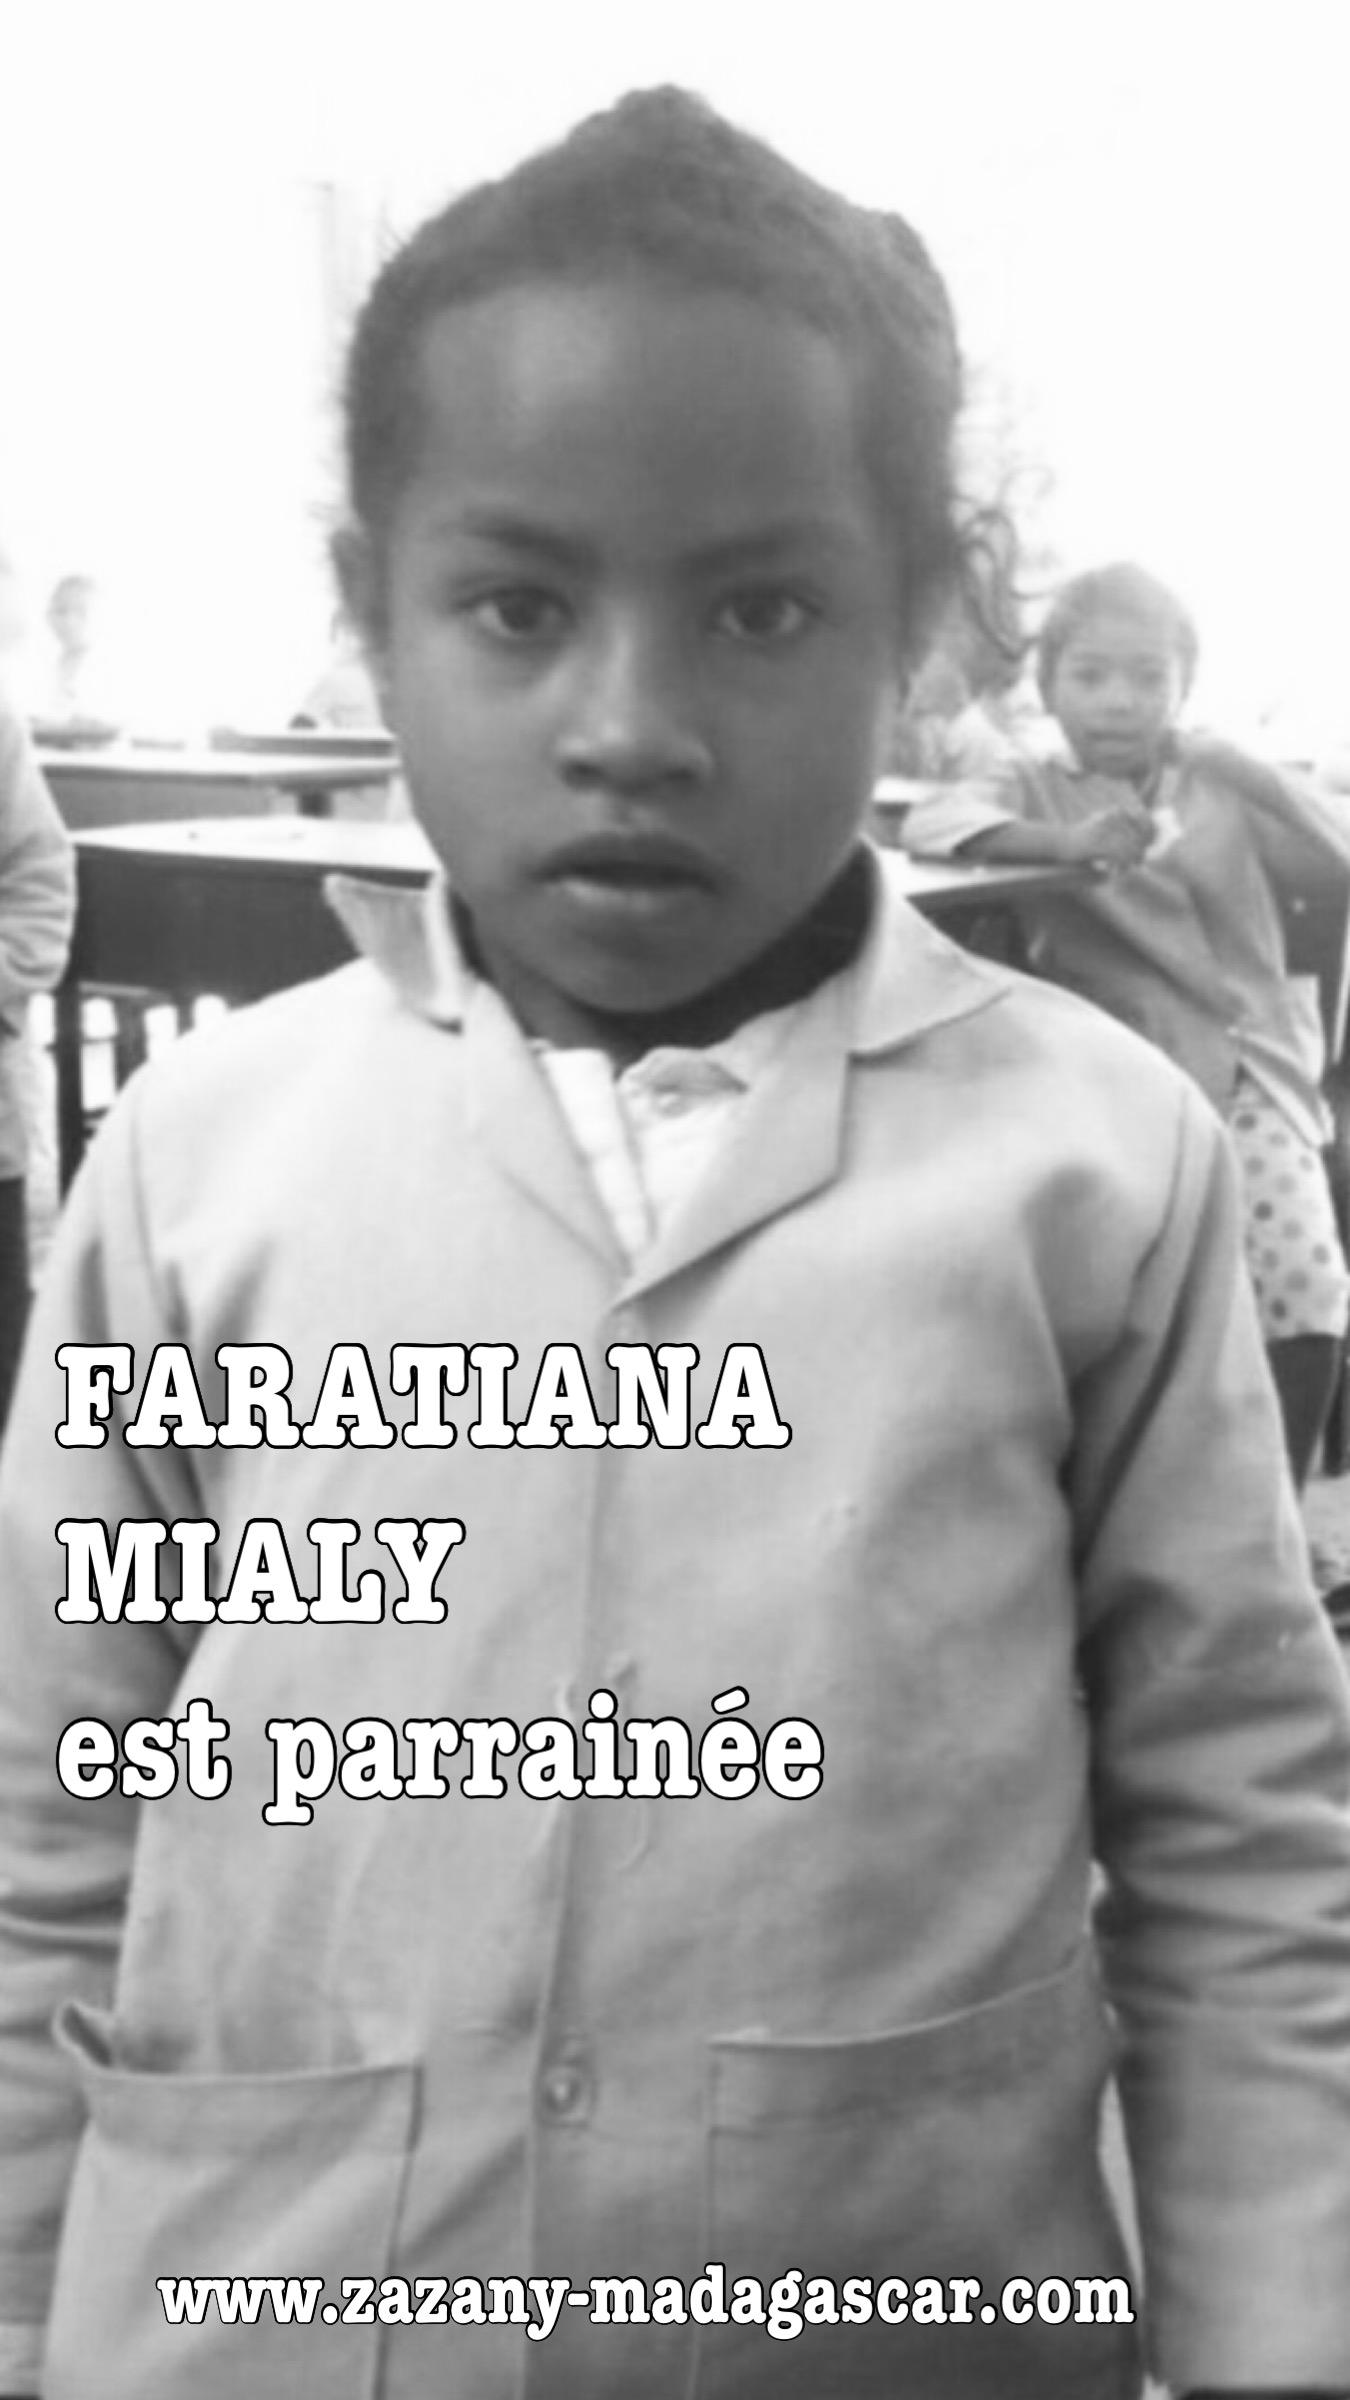 Faratiana - Filleule Zazany Madagascar - Mahamasina Est